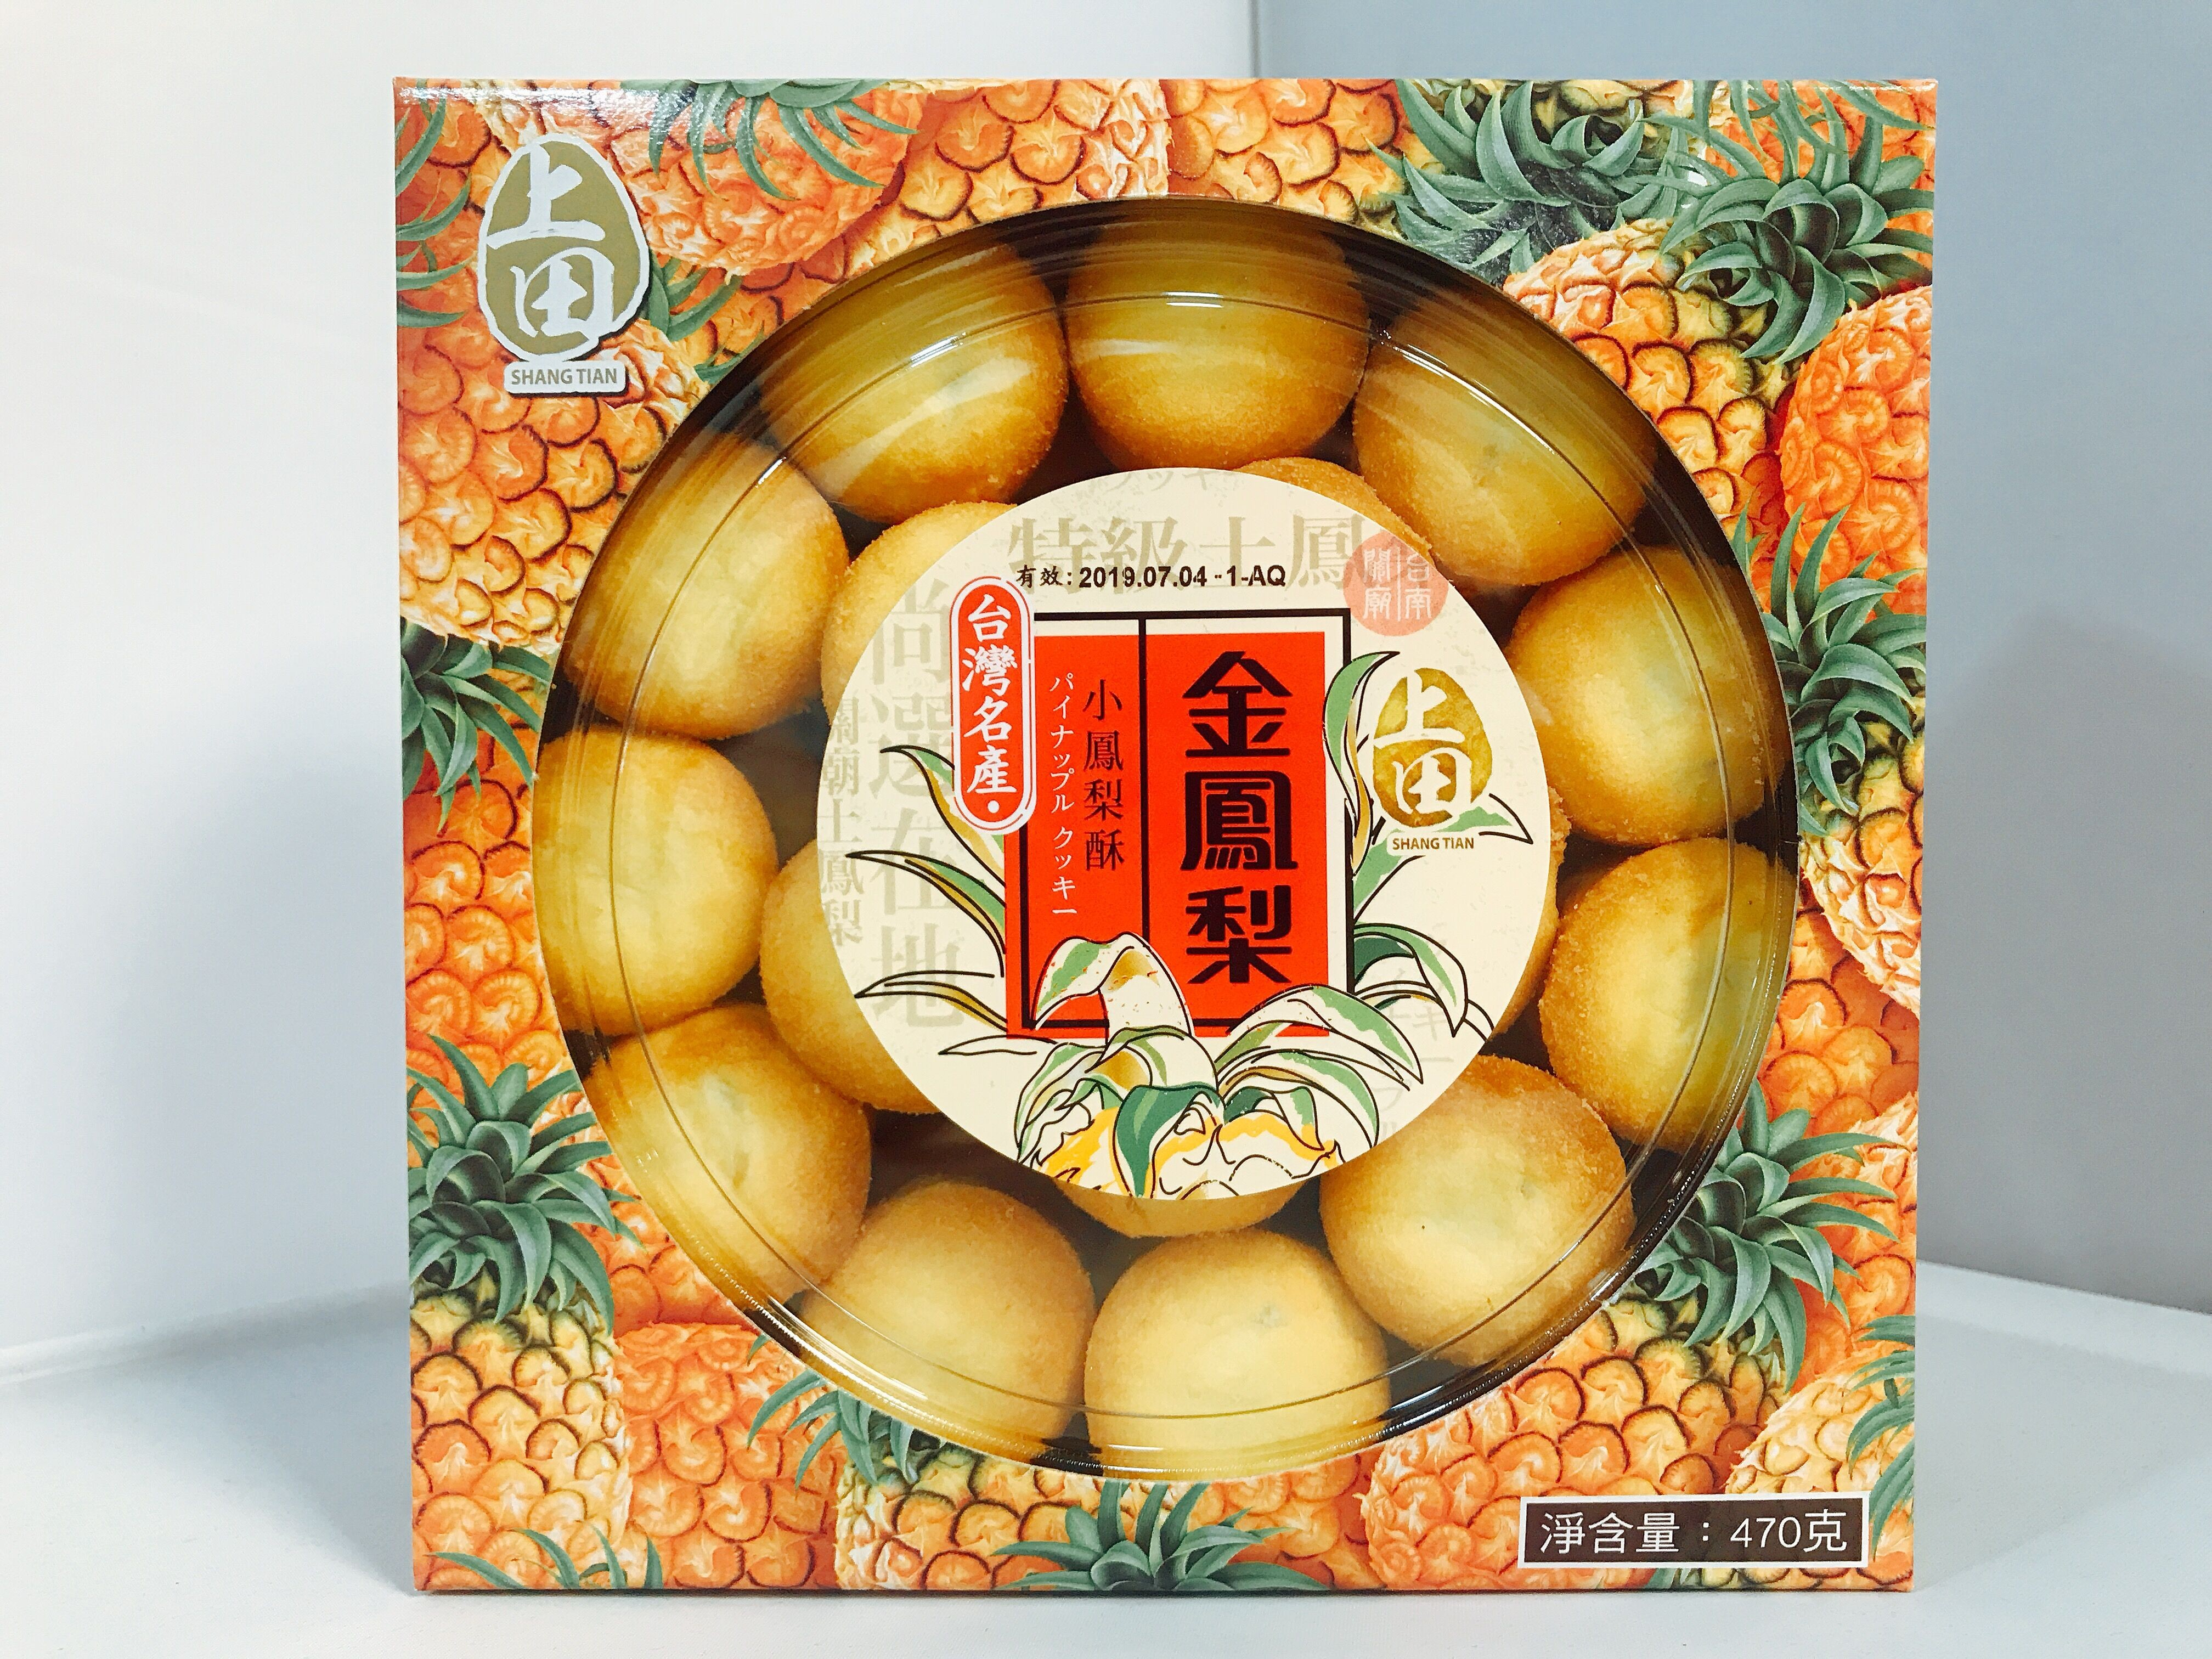 Pineapple cake 金鳳梨小鳳梨酥 (470g)